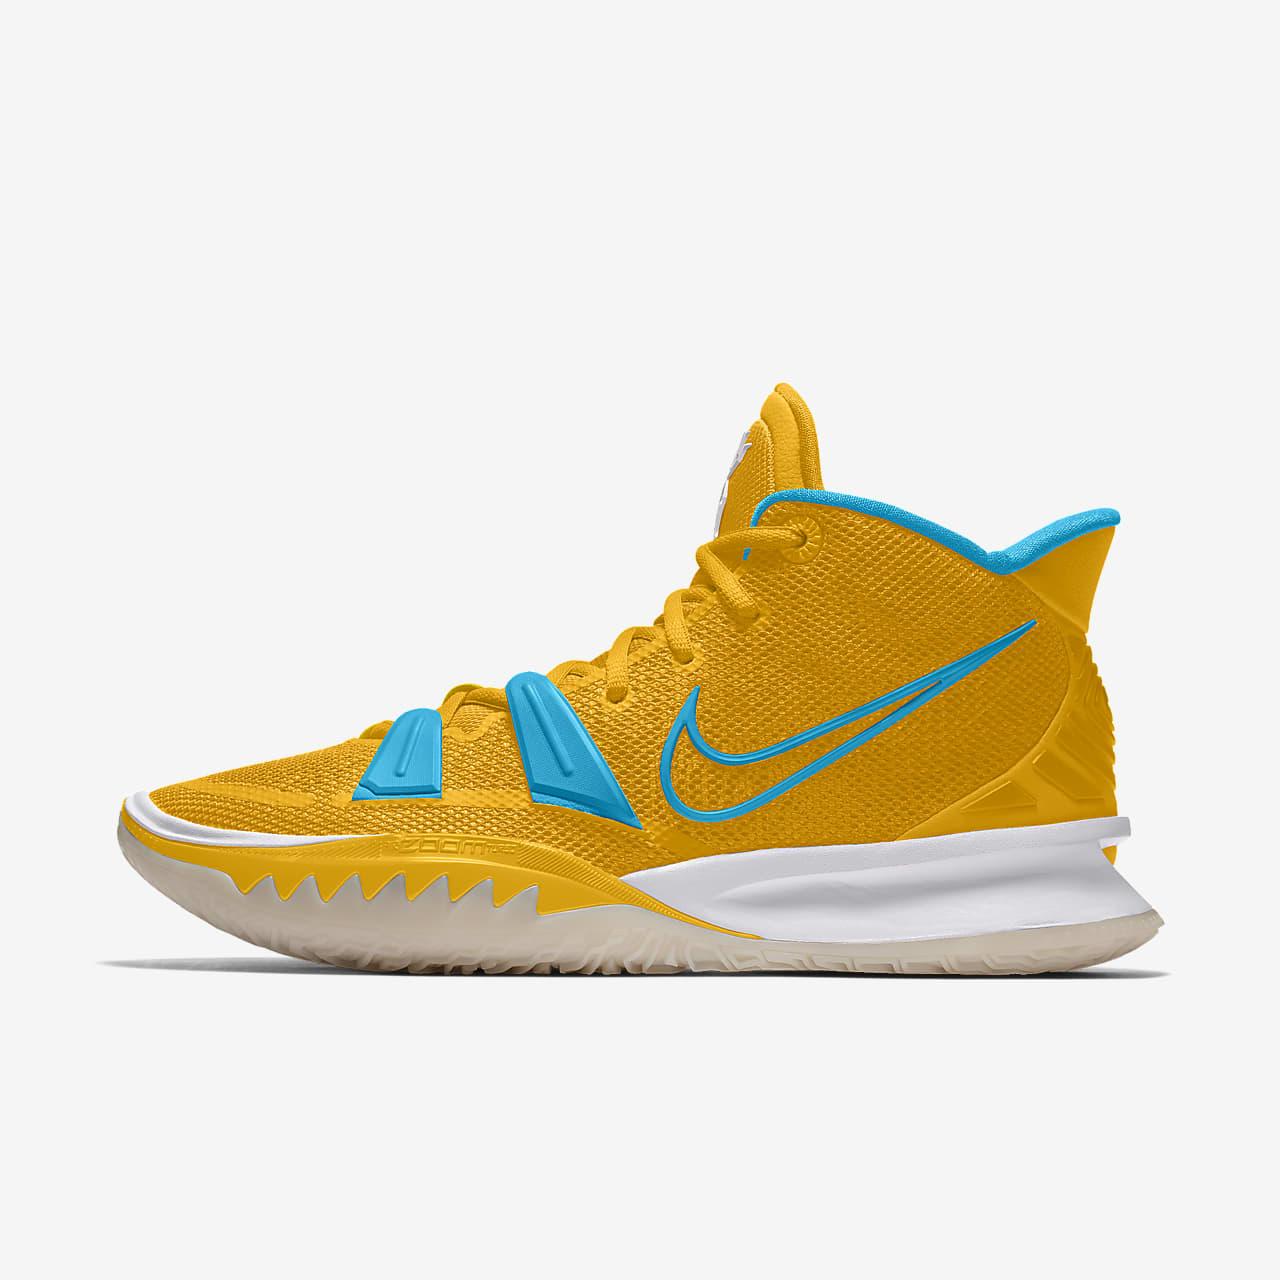 Scarpa da basket personalizzabile Kyrie 7 By You